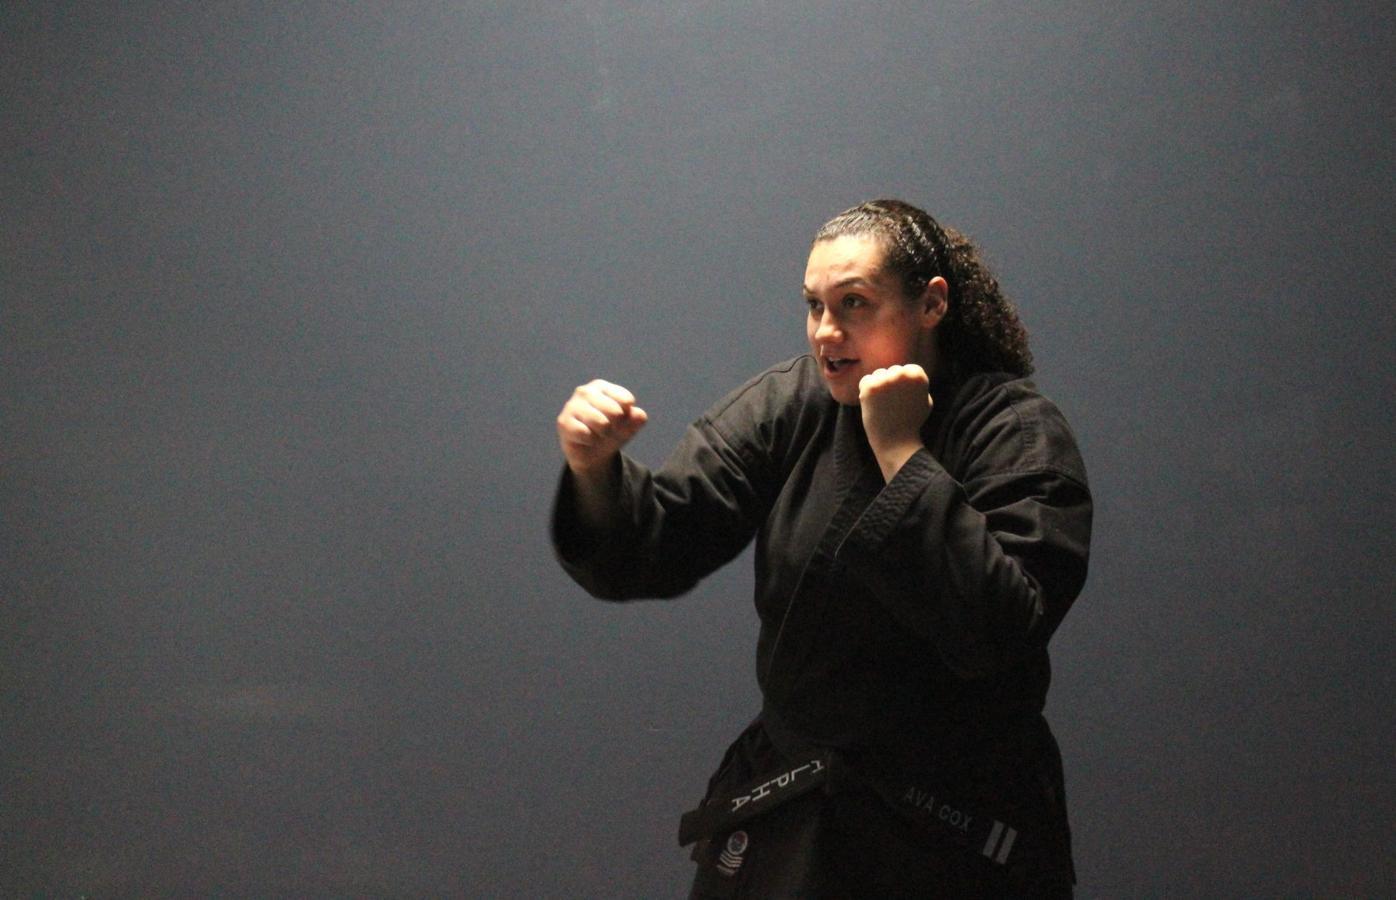 103020_whg_karatekid2.JPG